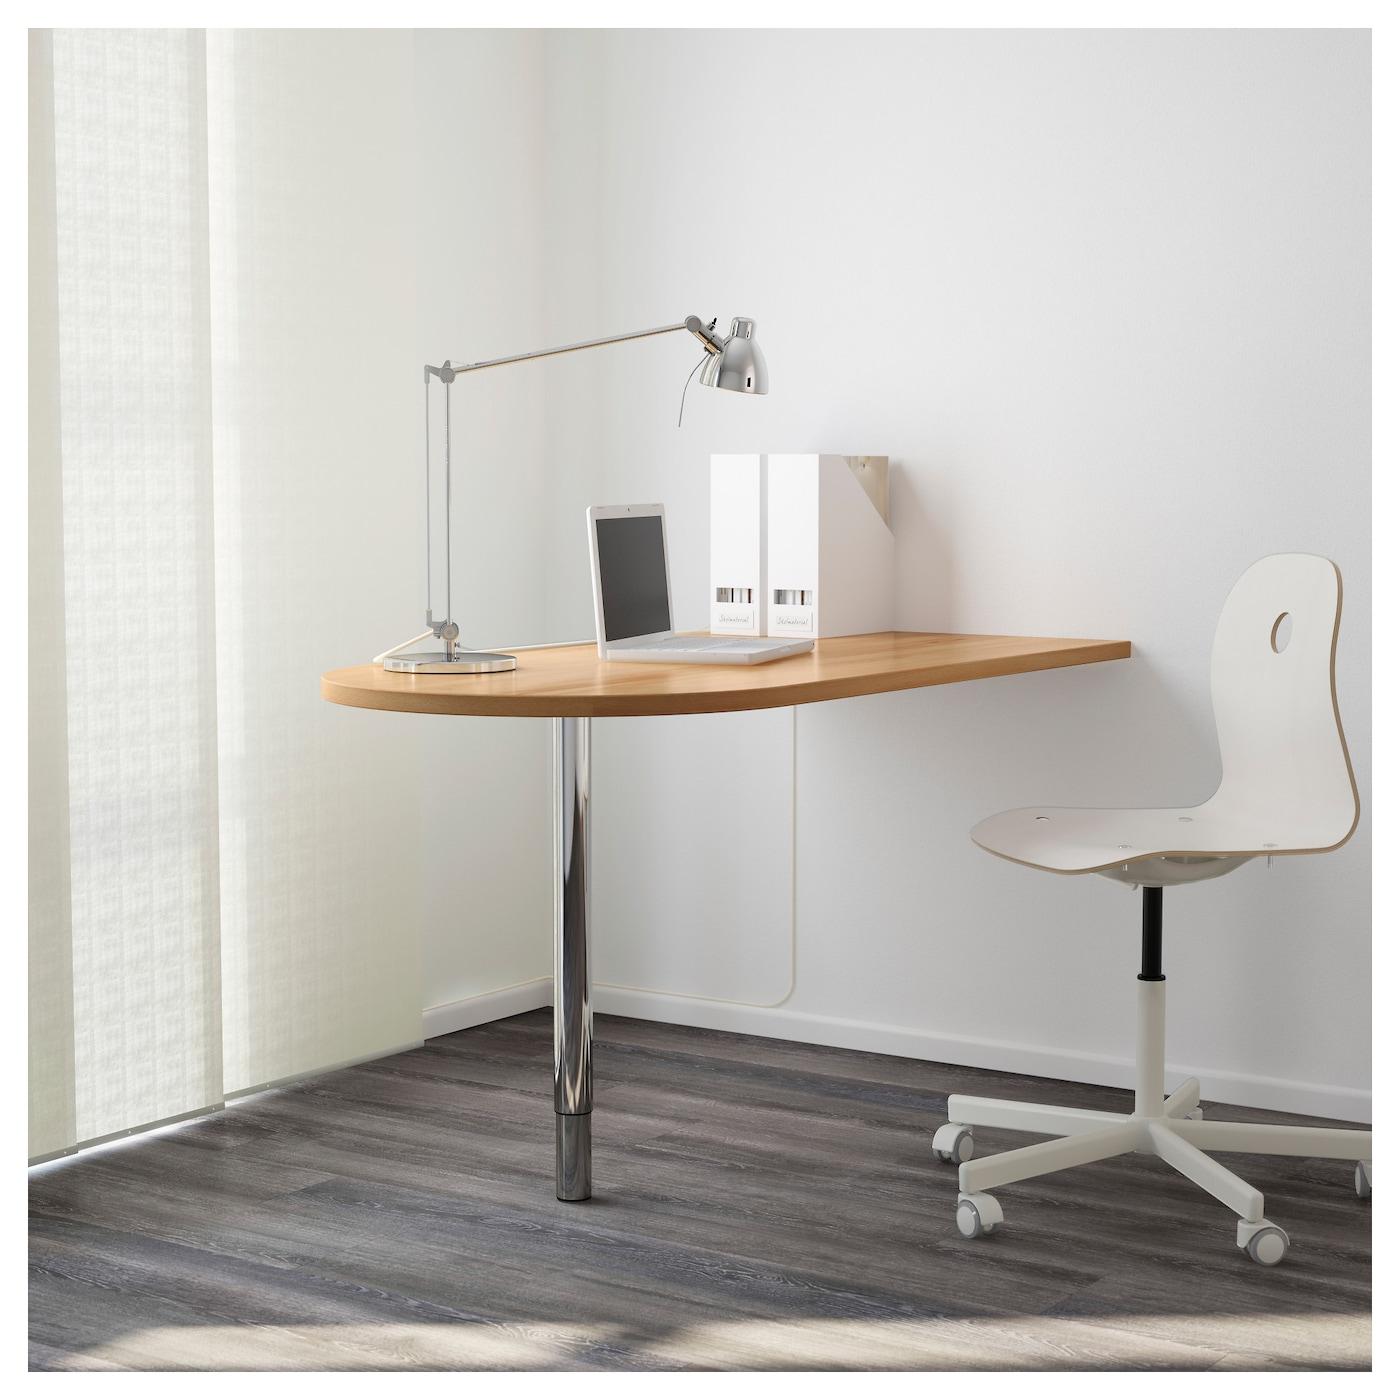 Gerton Pied Reglable Chrome Ikea